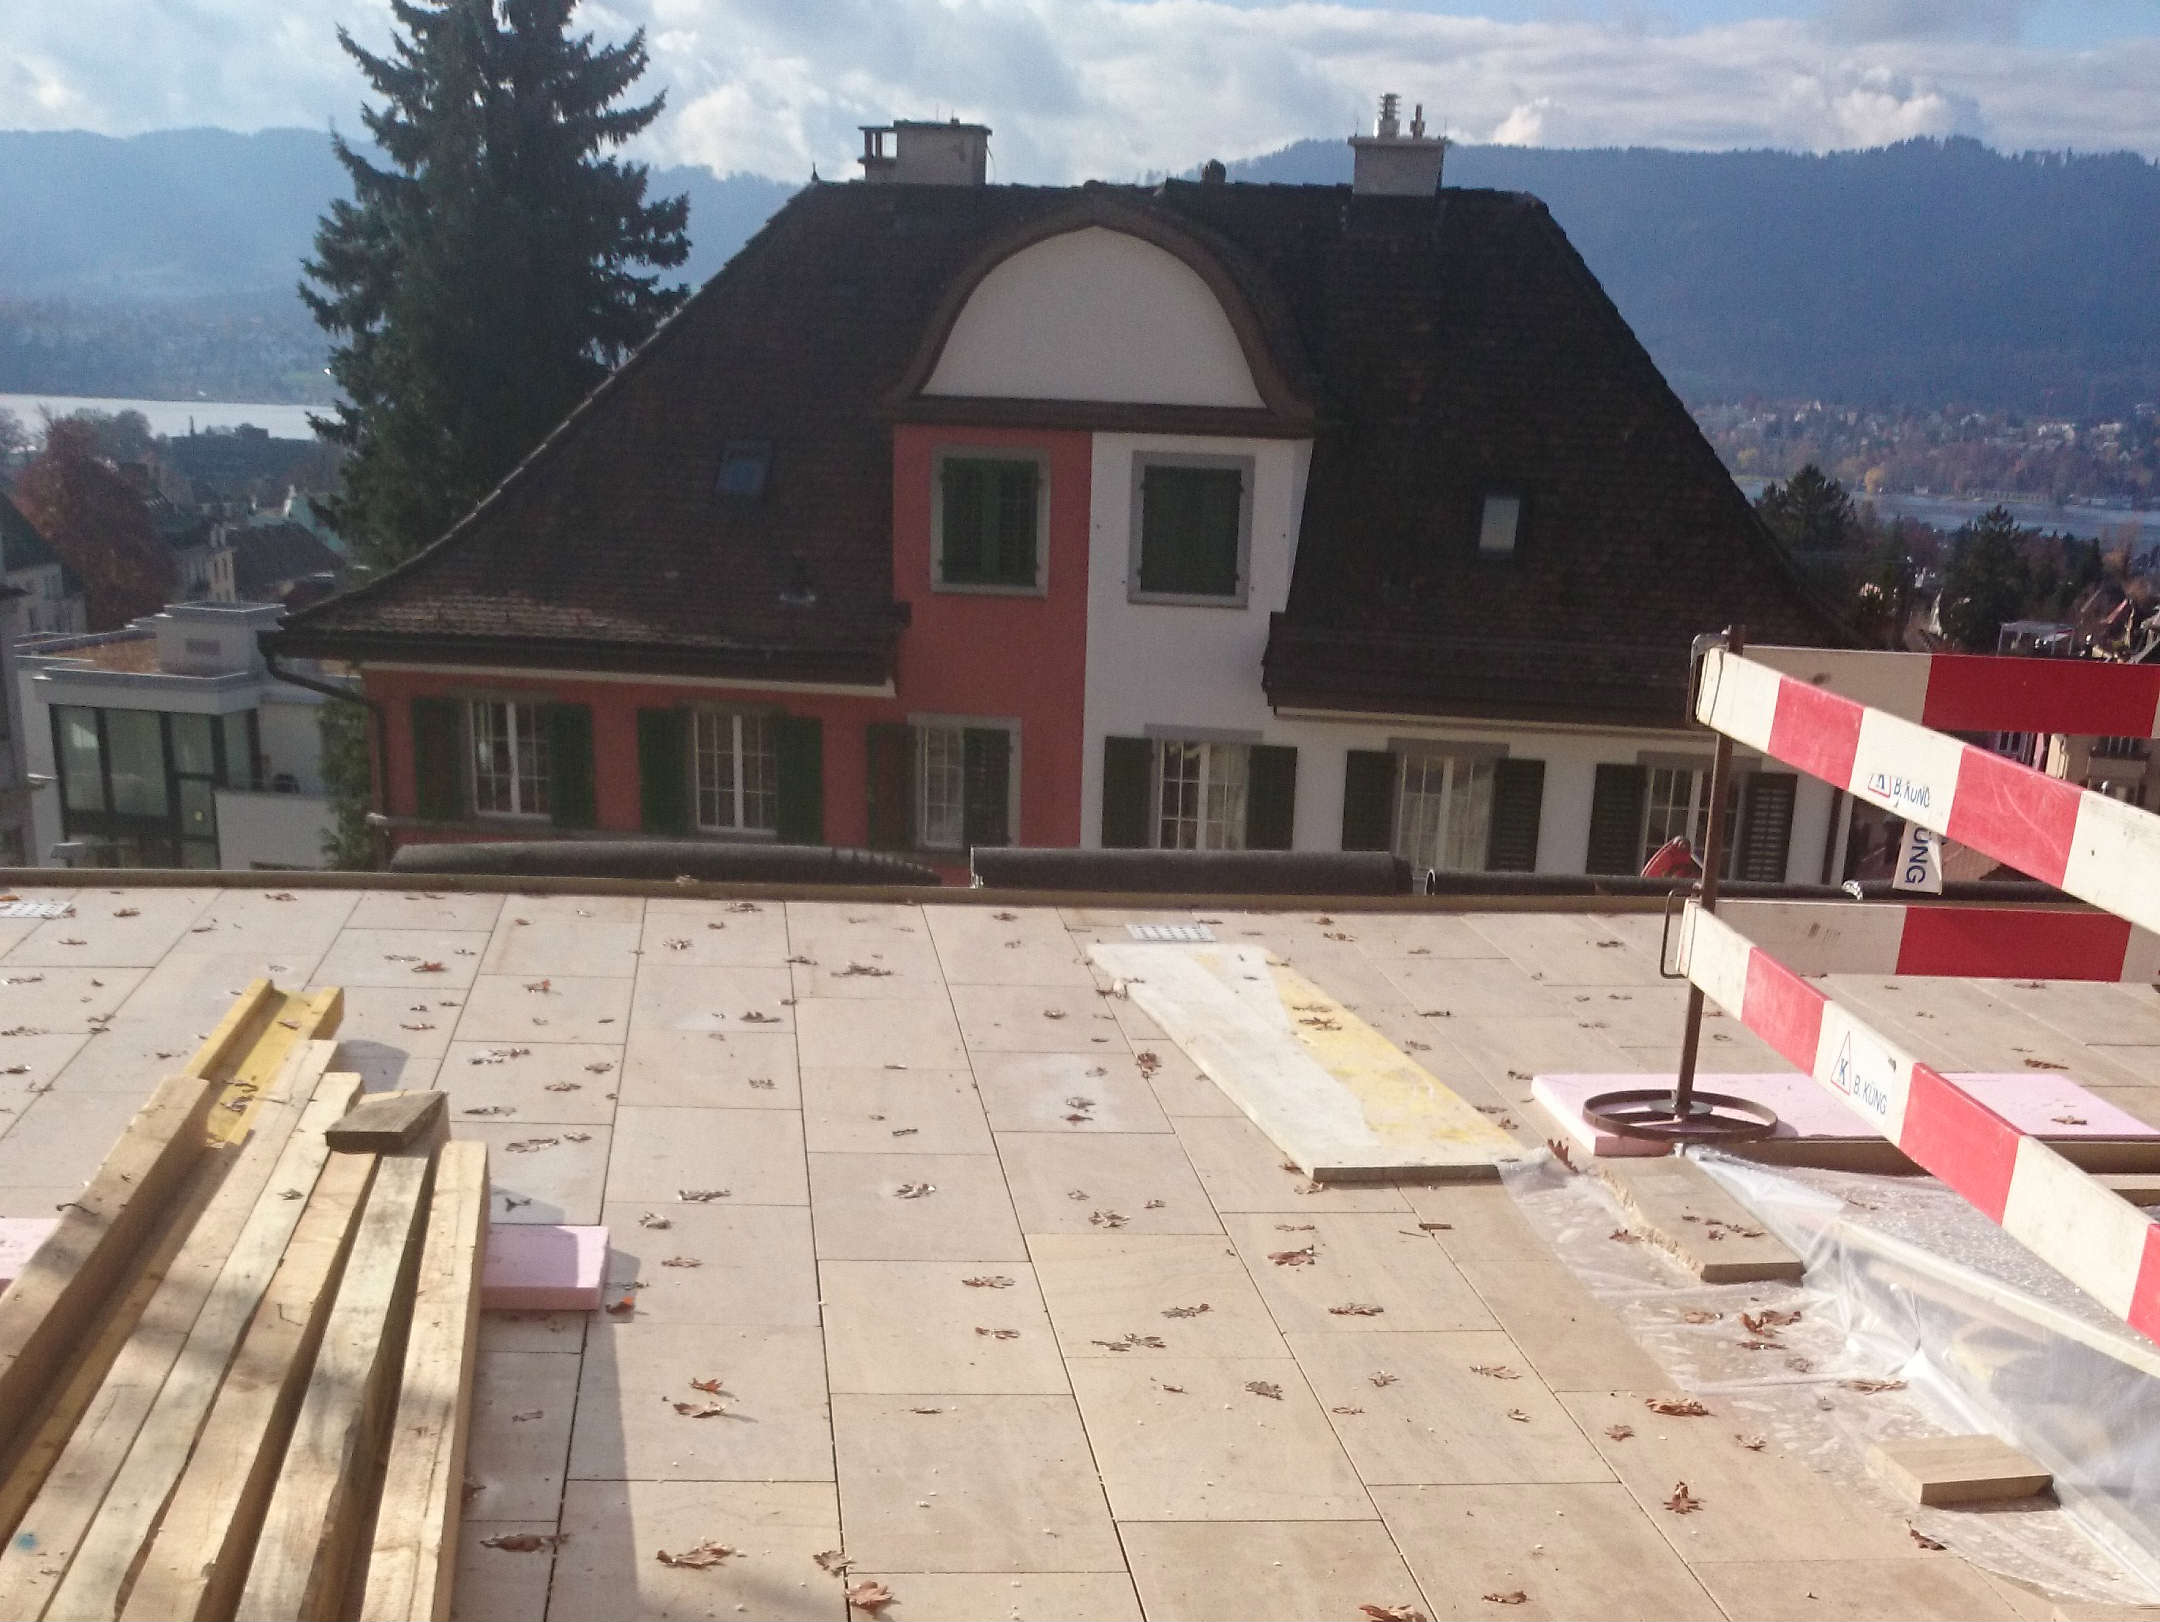 Terrace covering SETP Beaunotte zurich villa switzerland